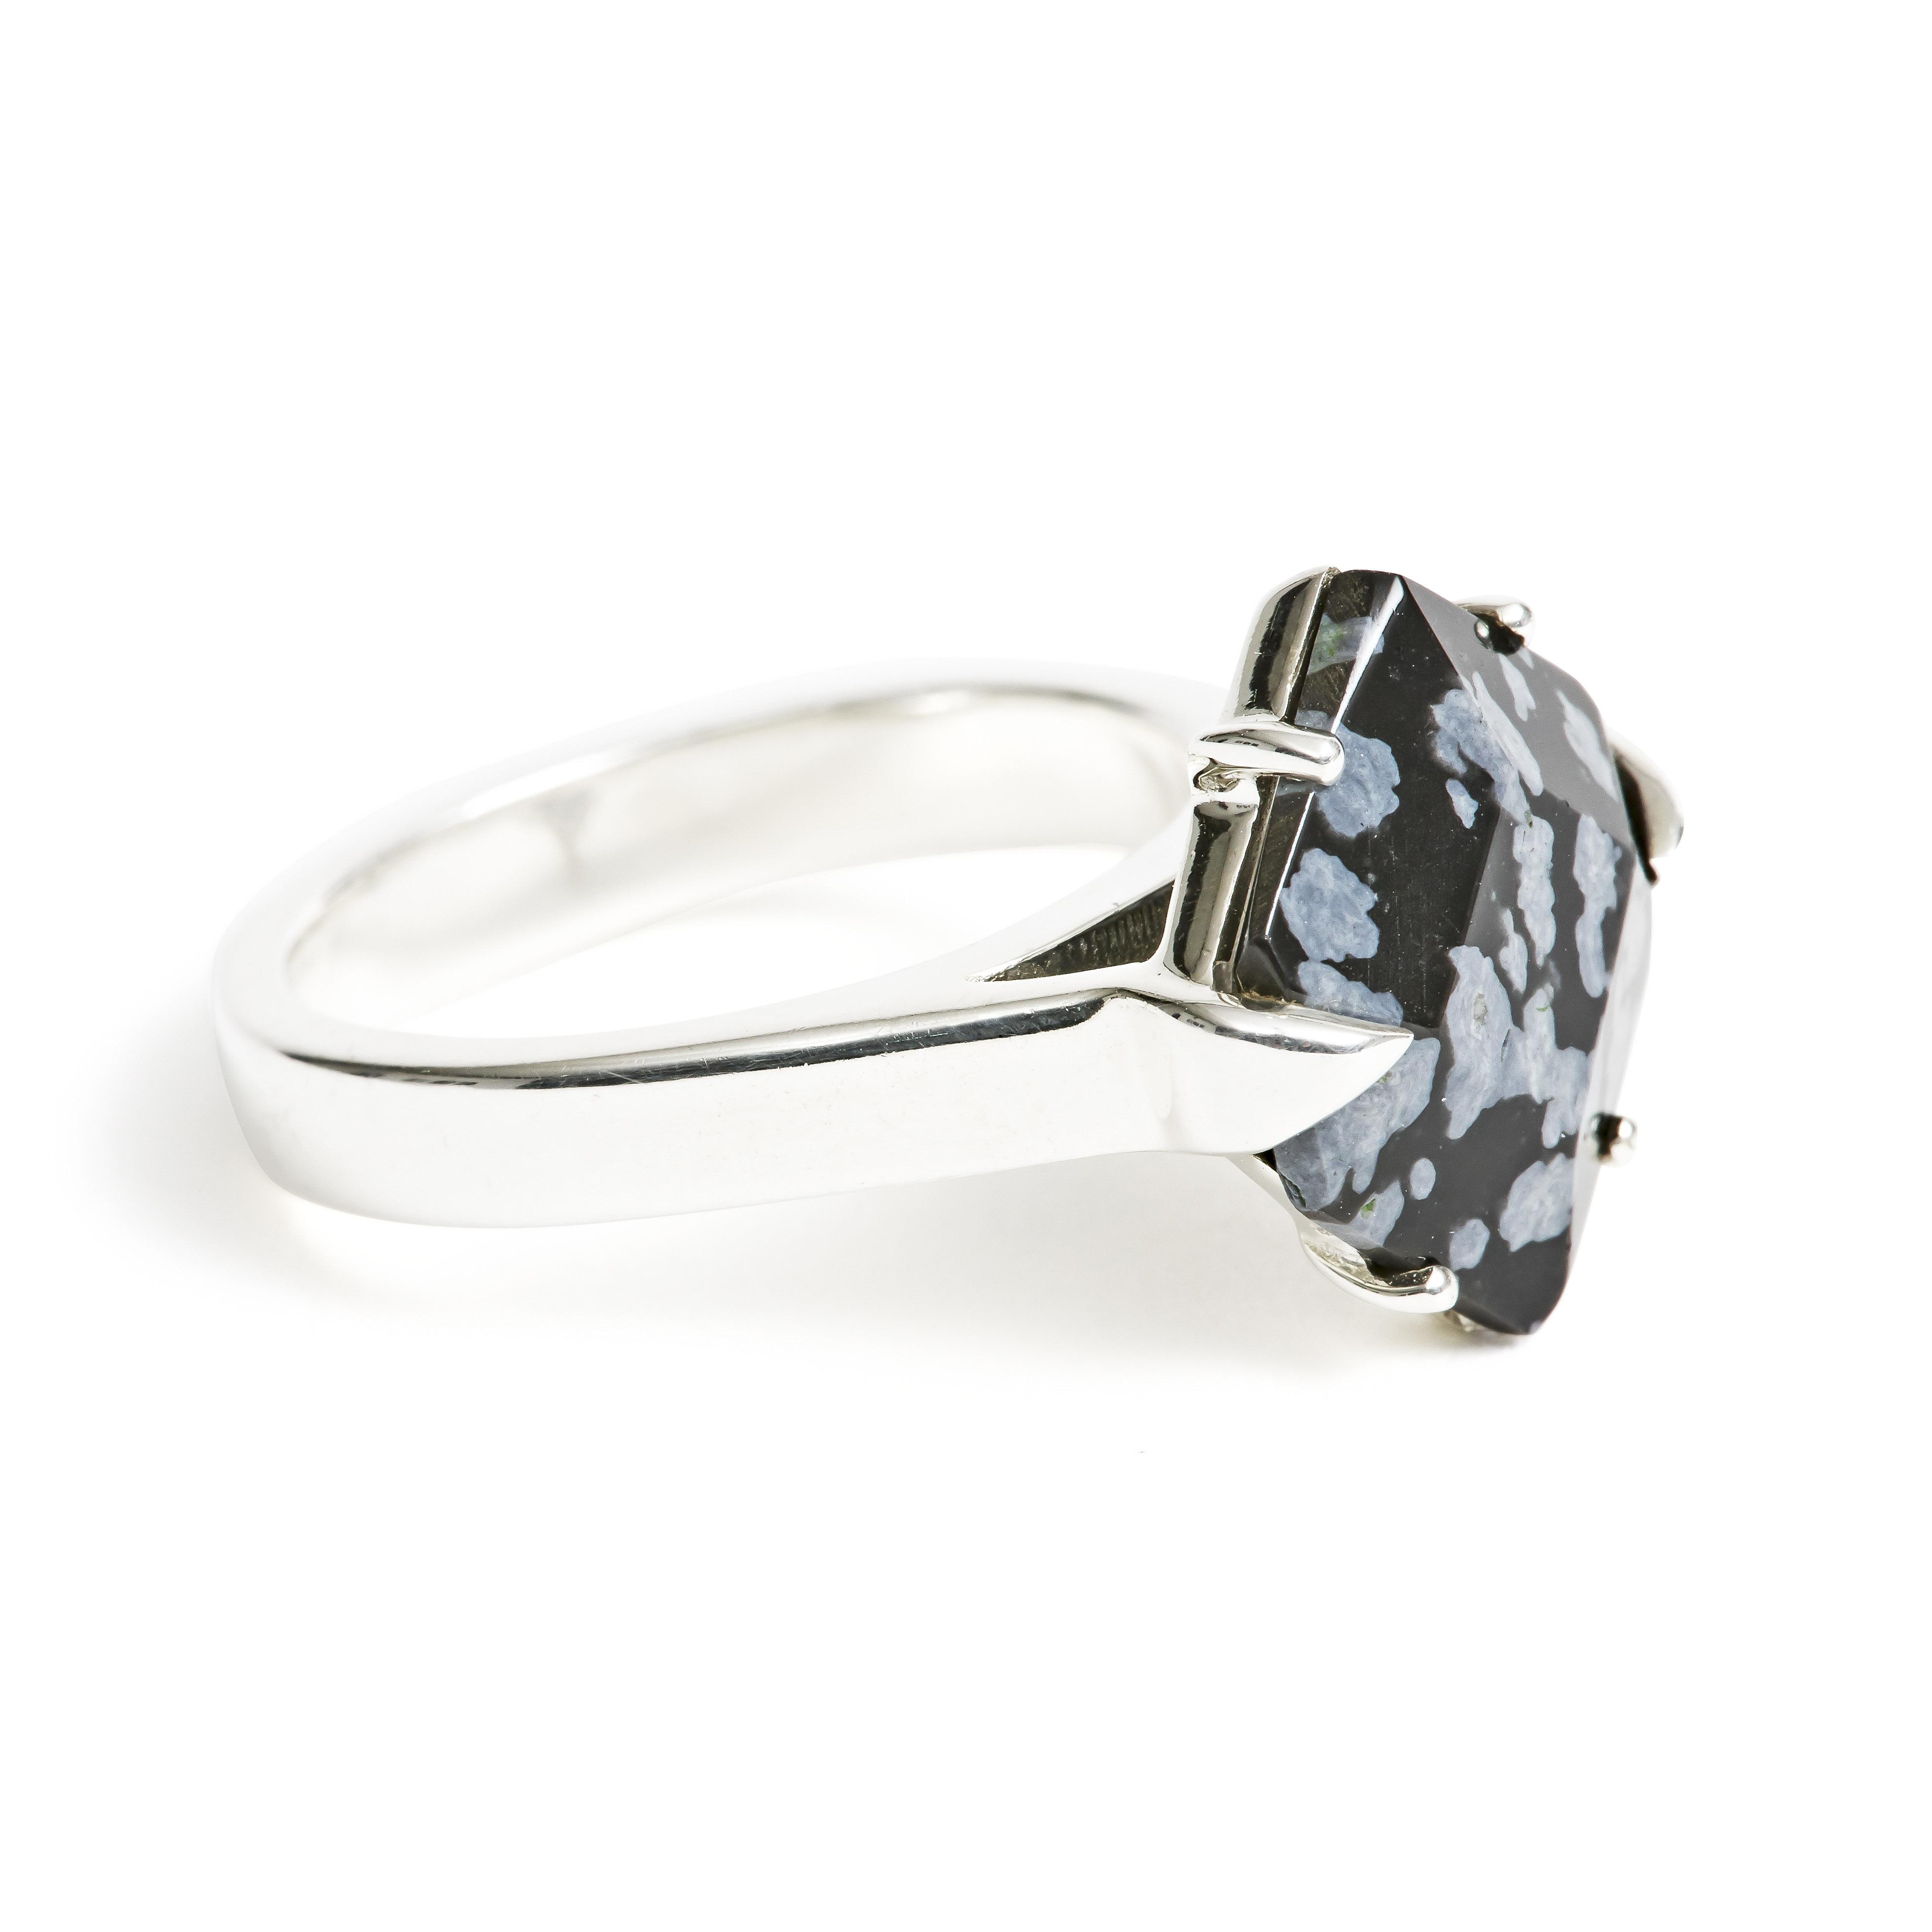 obsidian-silver-ring